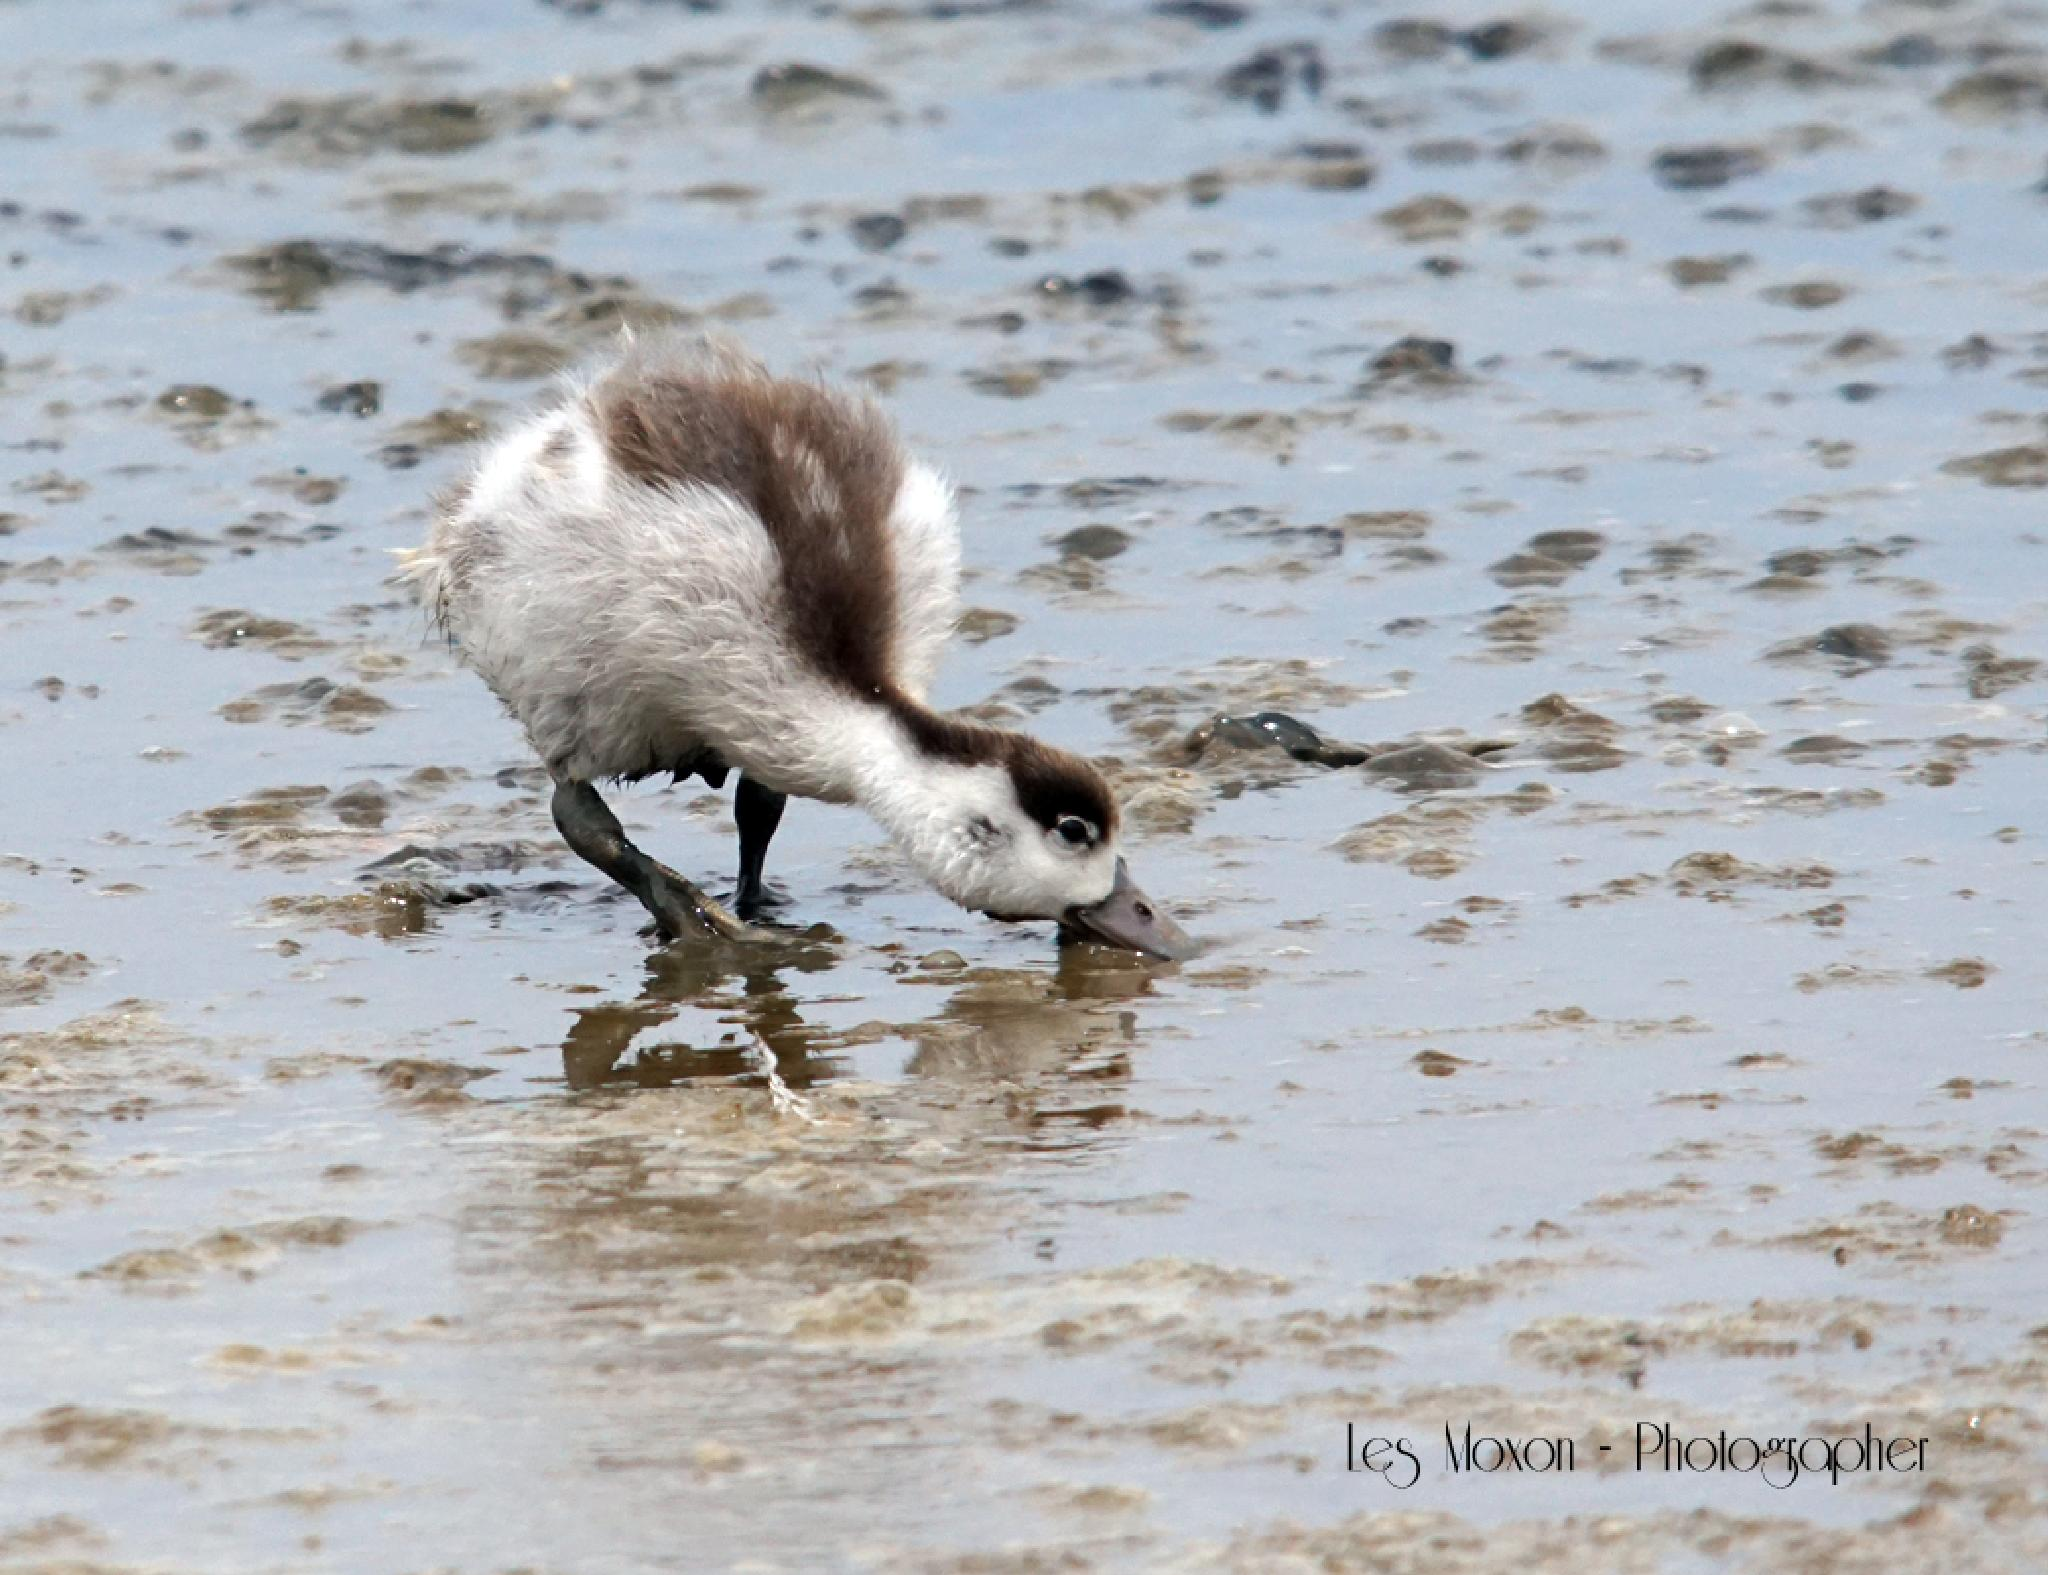 Shelduck Chick by Les Moxon Photography